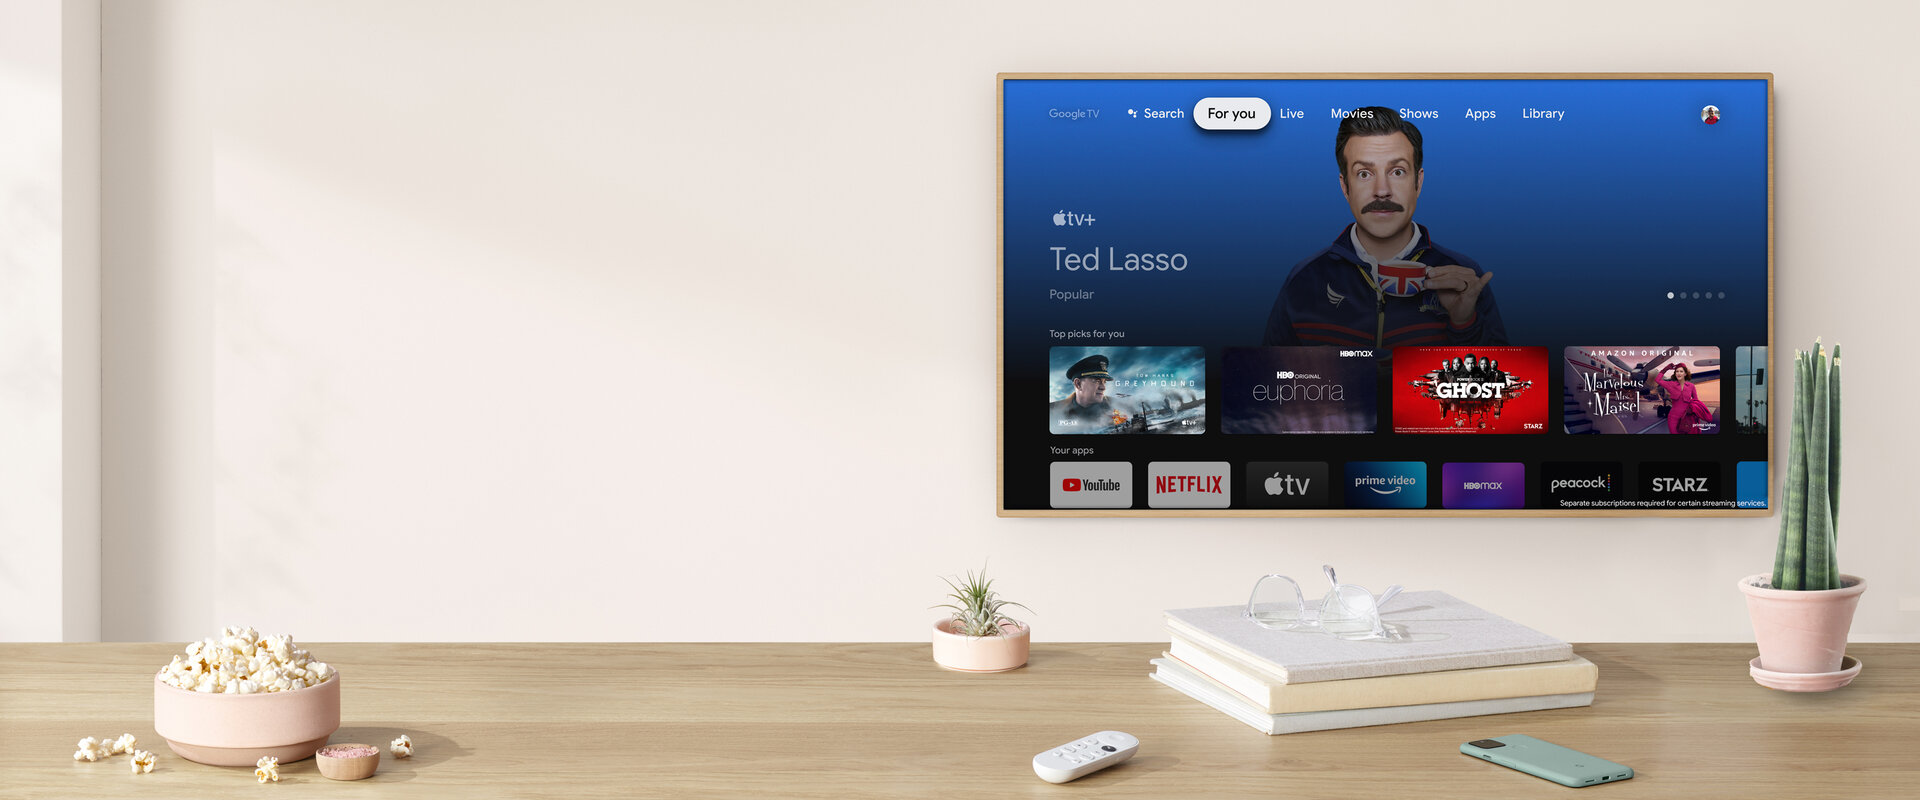 Apple TV+ auf dem Chromecast mit Google TV